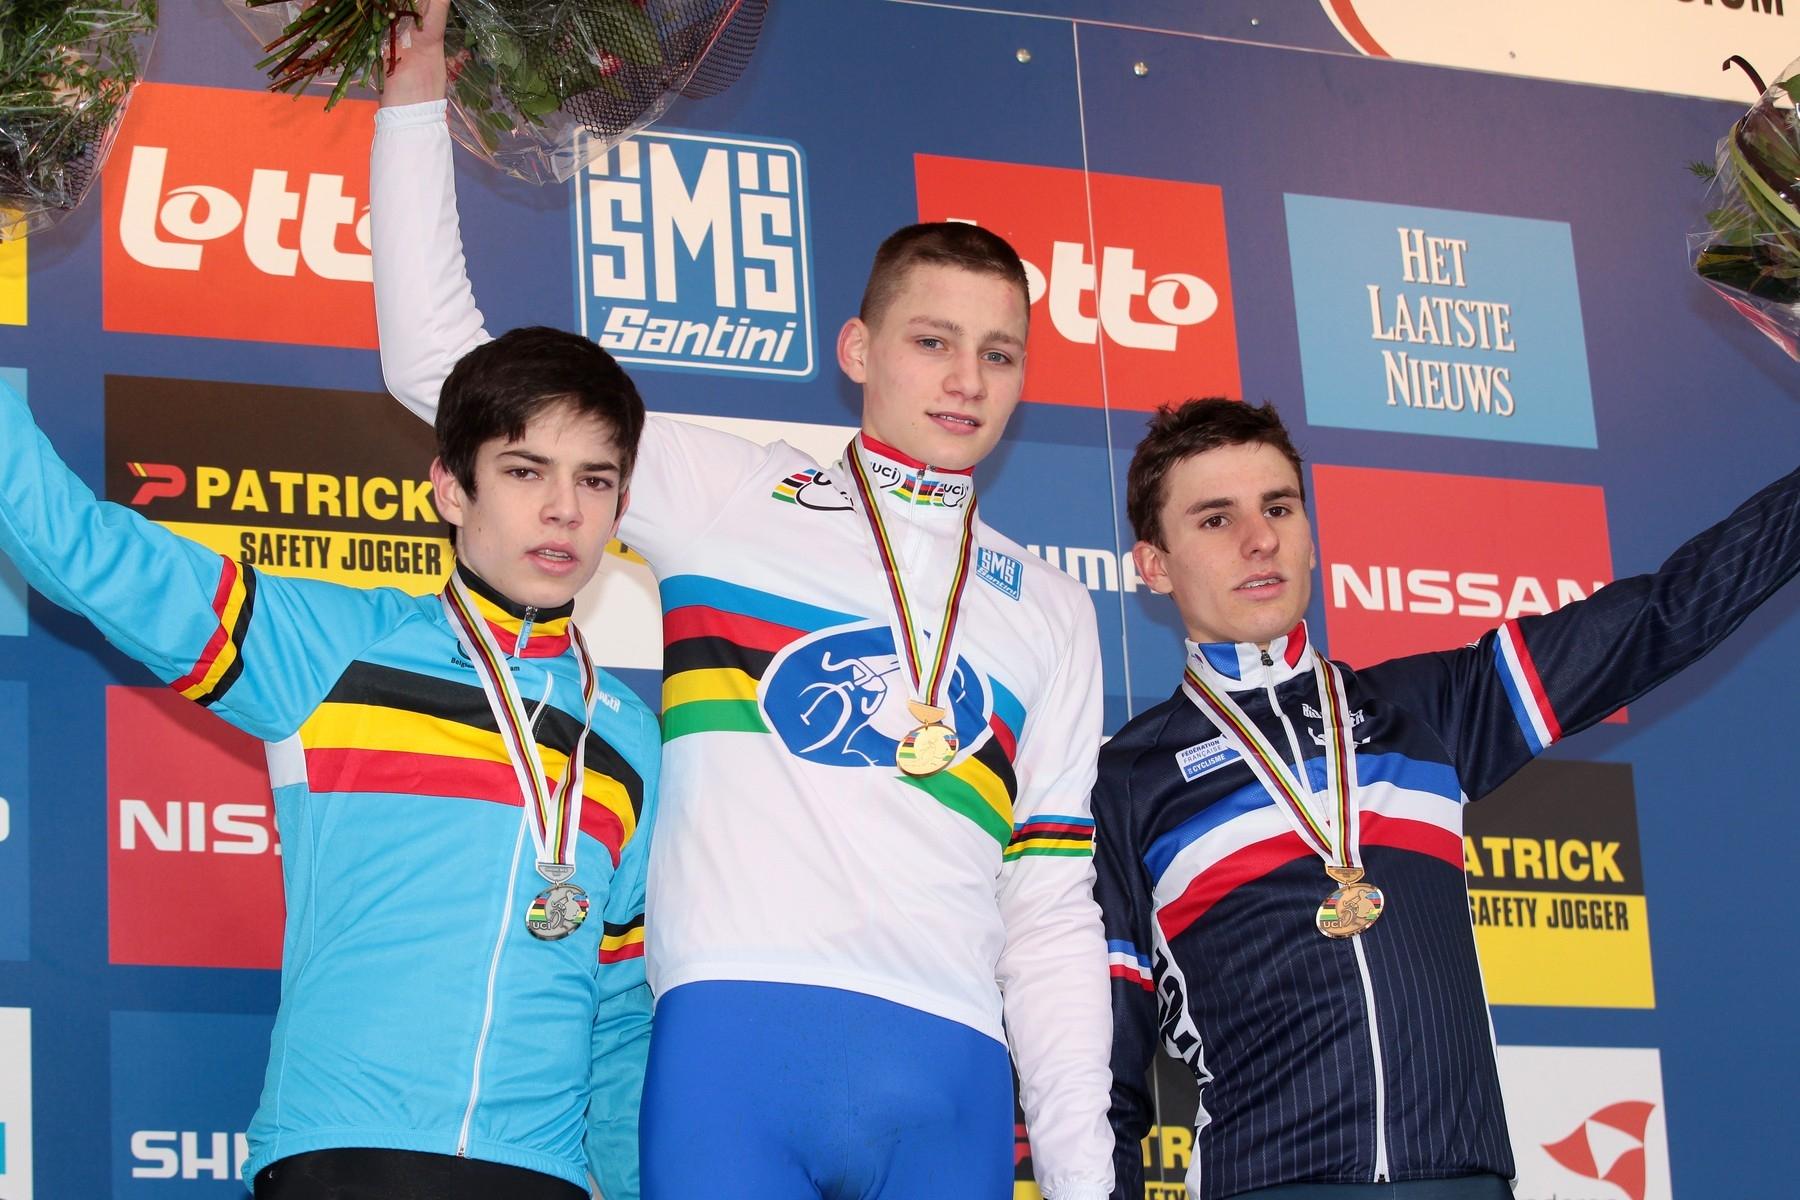 Začátek přetahované aneb Kooksijde 2012. Mathieu van der Poel slaví titul cyklokrosového šampiona mezi juniory, vlevo stříbrný Wout van Aert a vpravo třetí Francouz Quentin Jauregui. Foto: profimedia.